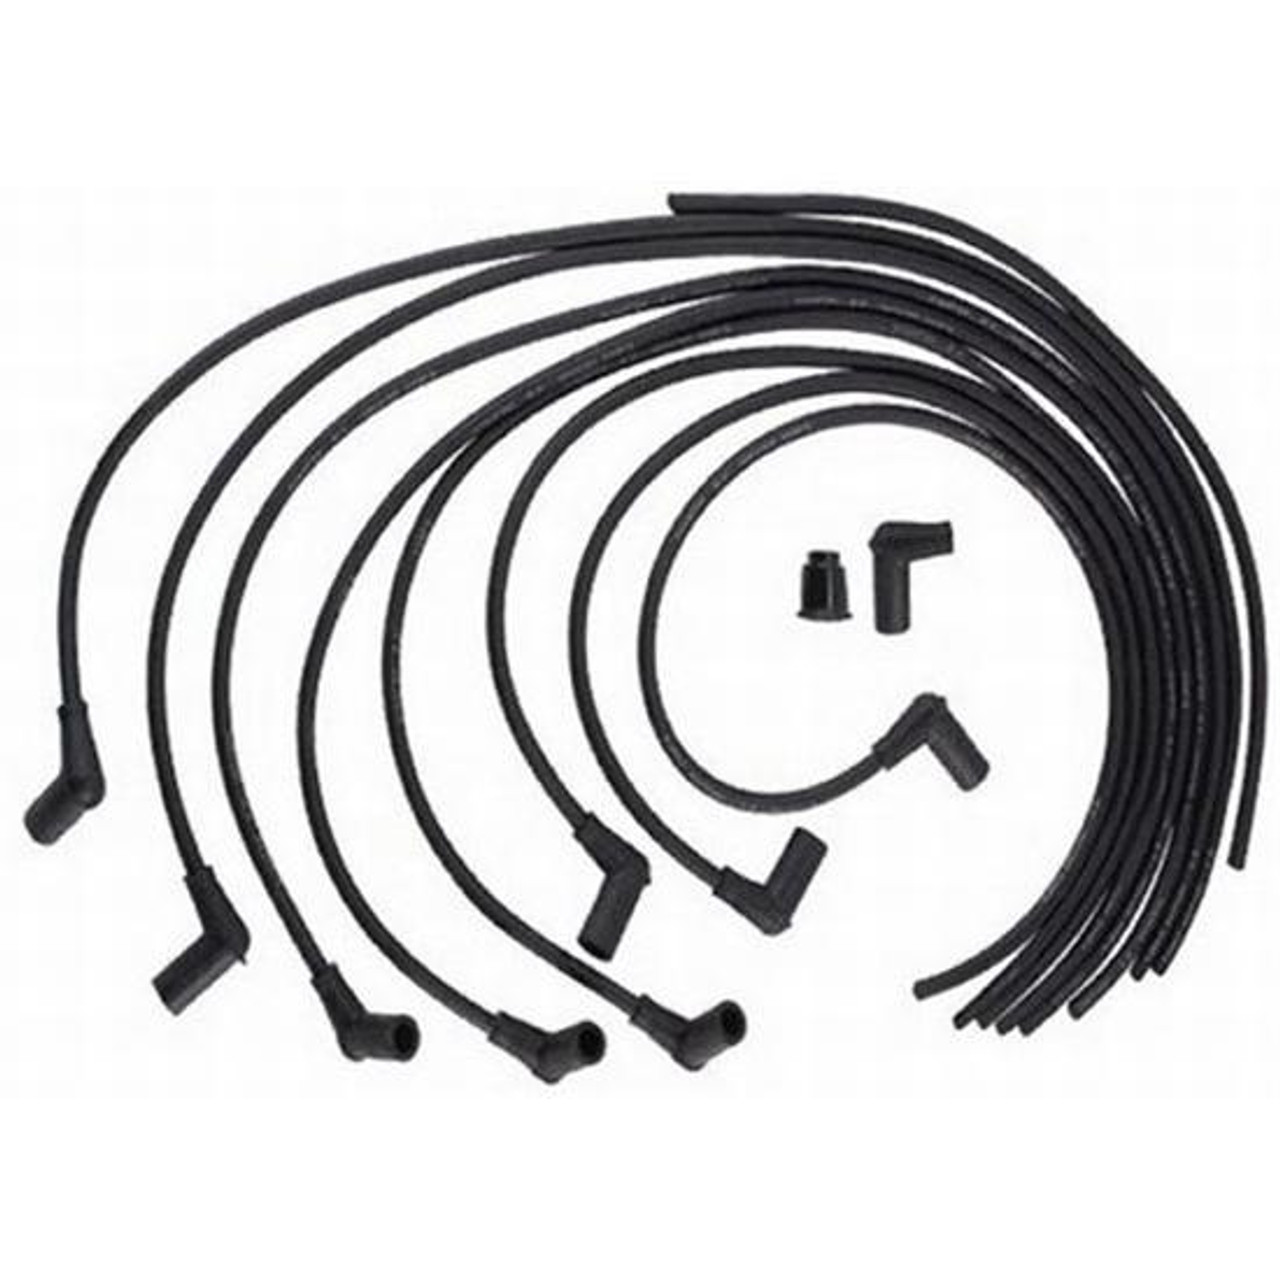 Moroso Flathead Universal Spark Plug Wires Kit - 64011